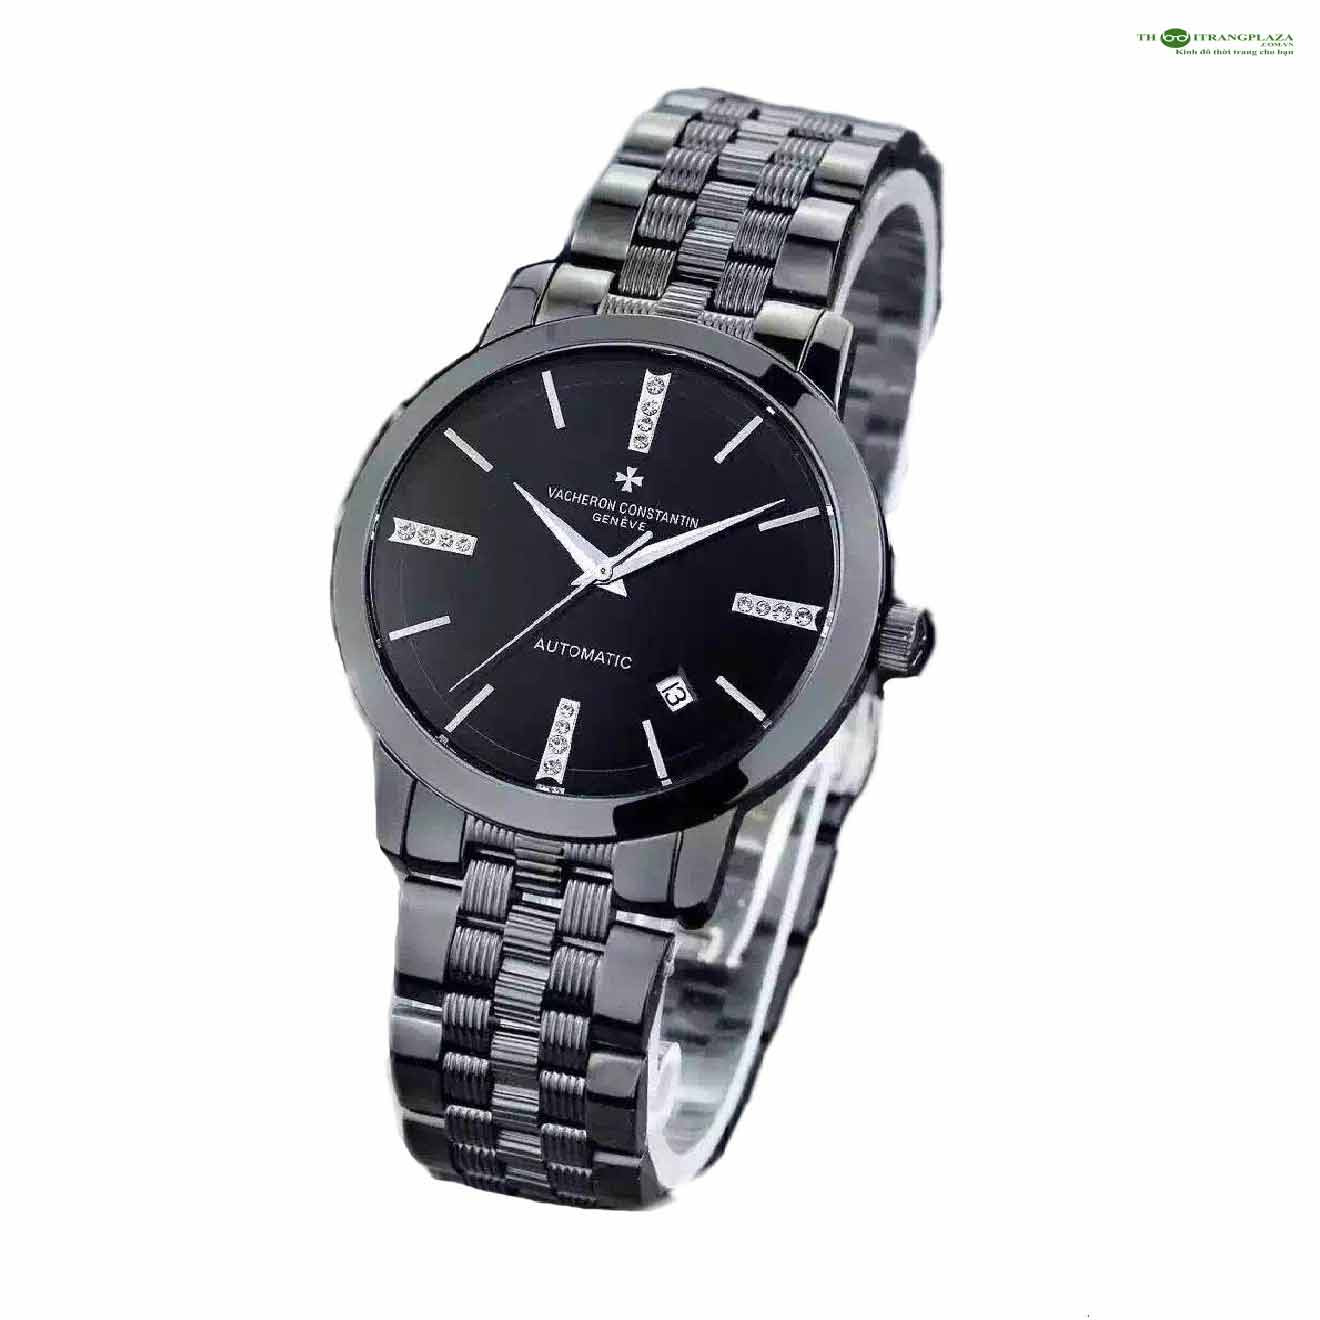 Đồng hồ nam cao cấp Vacheron Constantin VC01